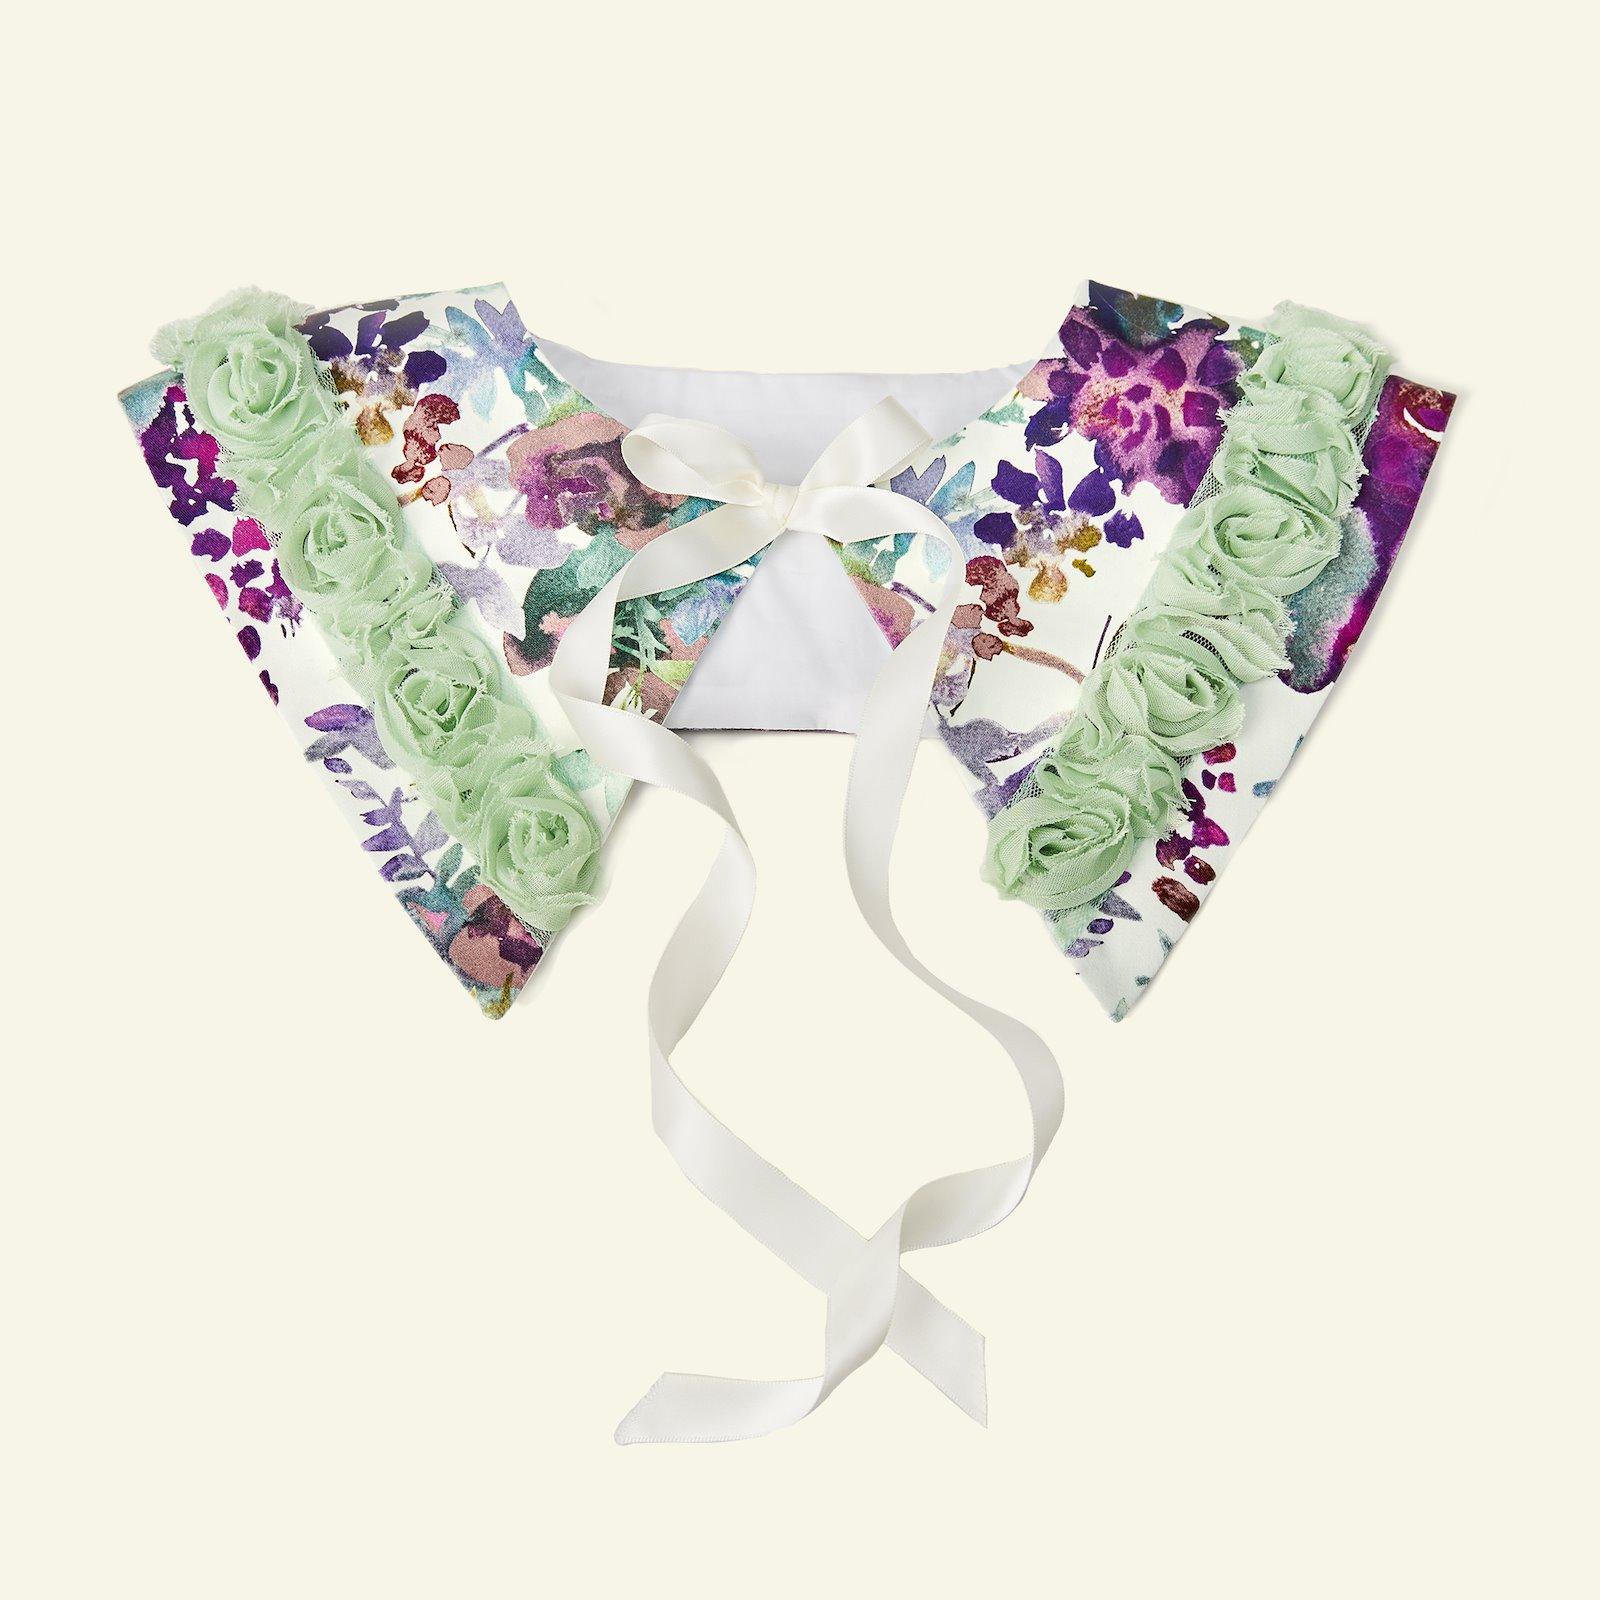 Ribbon tulle flower 60mm mint 2m p90335_460859_82413_27202_sskit